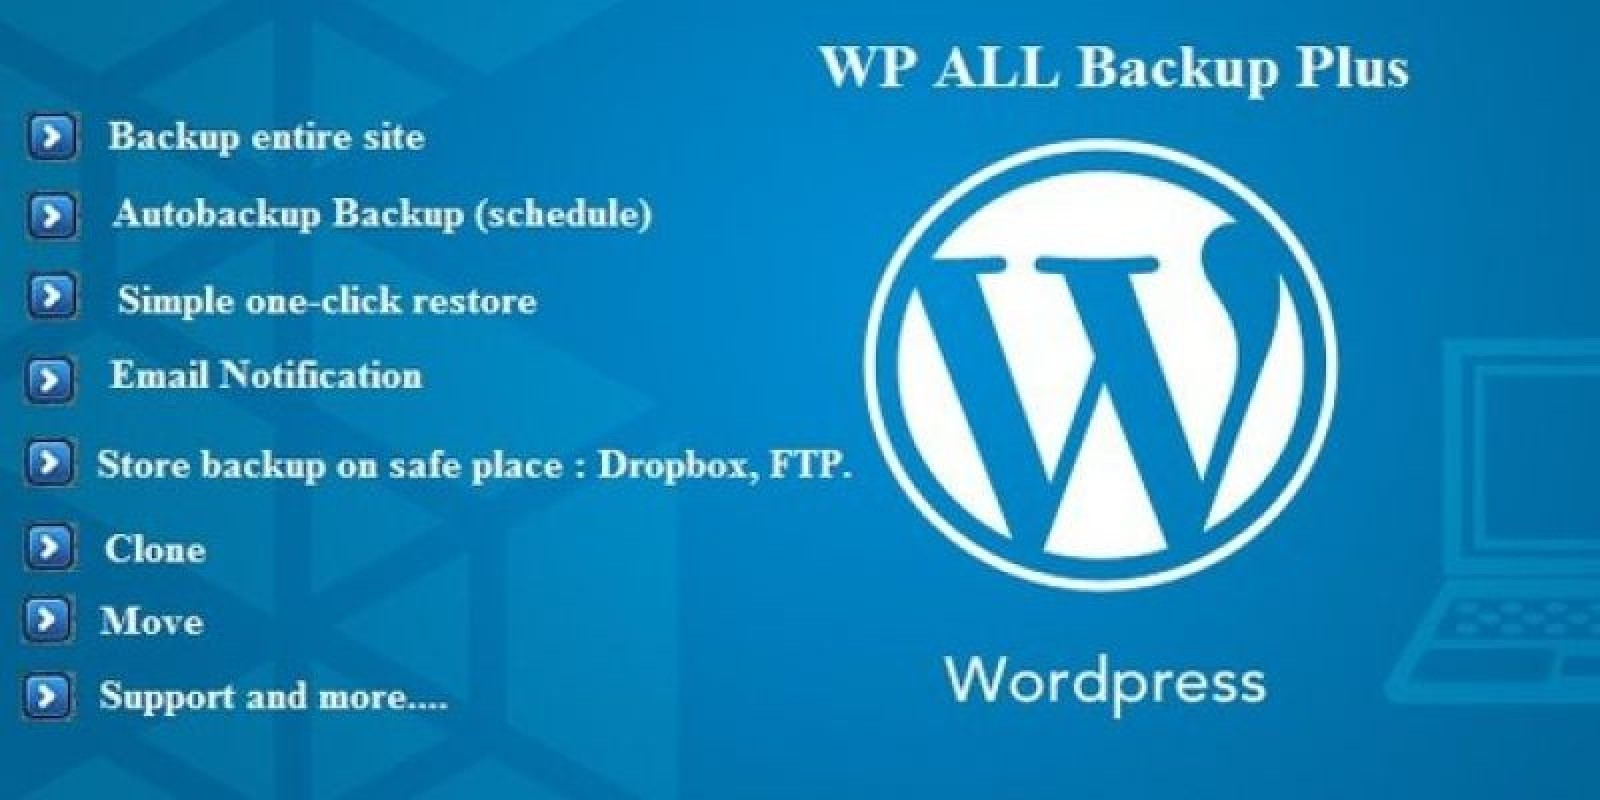 WP All Backup Plus - WordPress Plugin